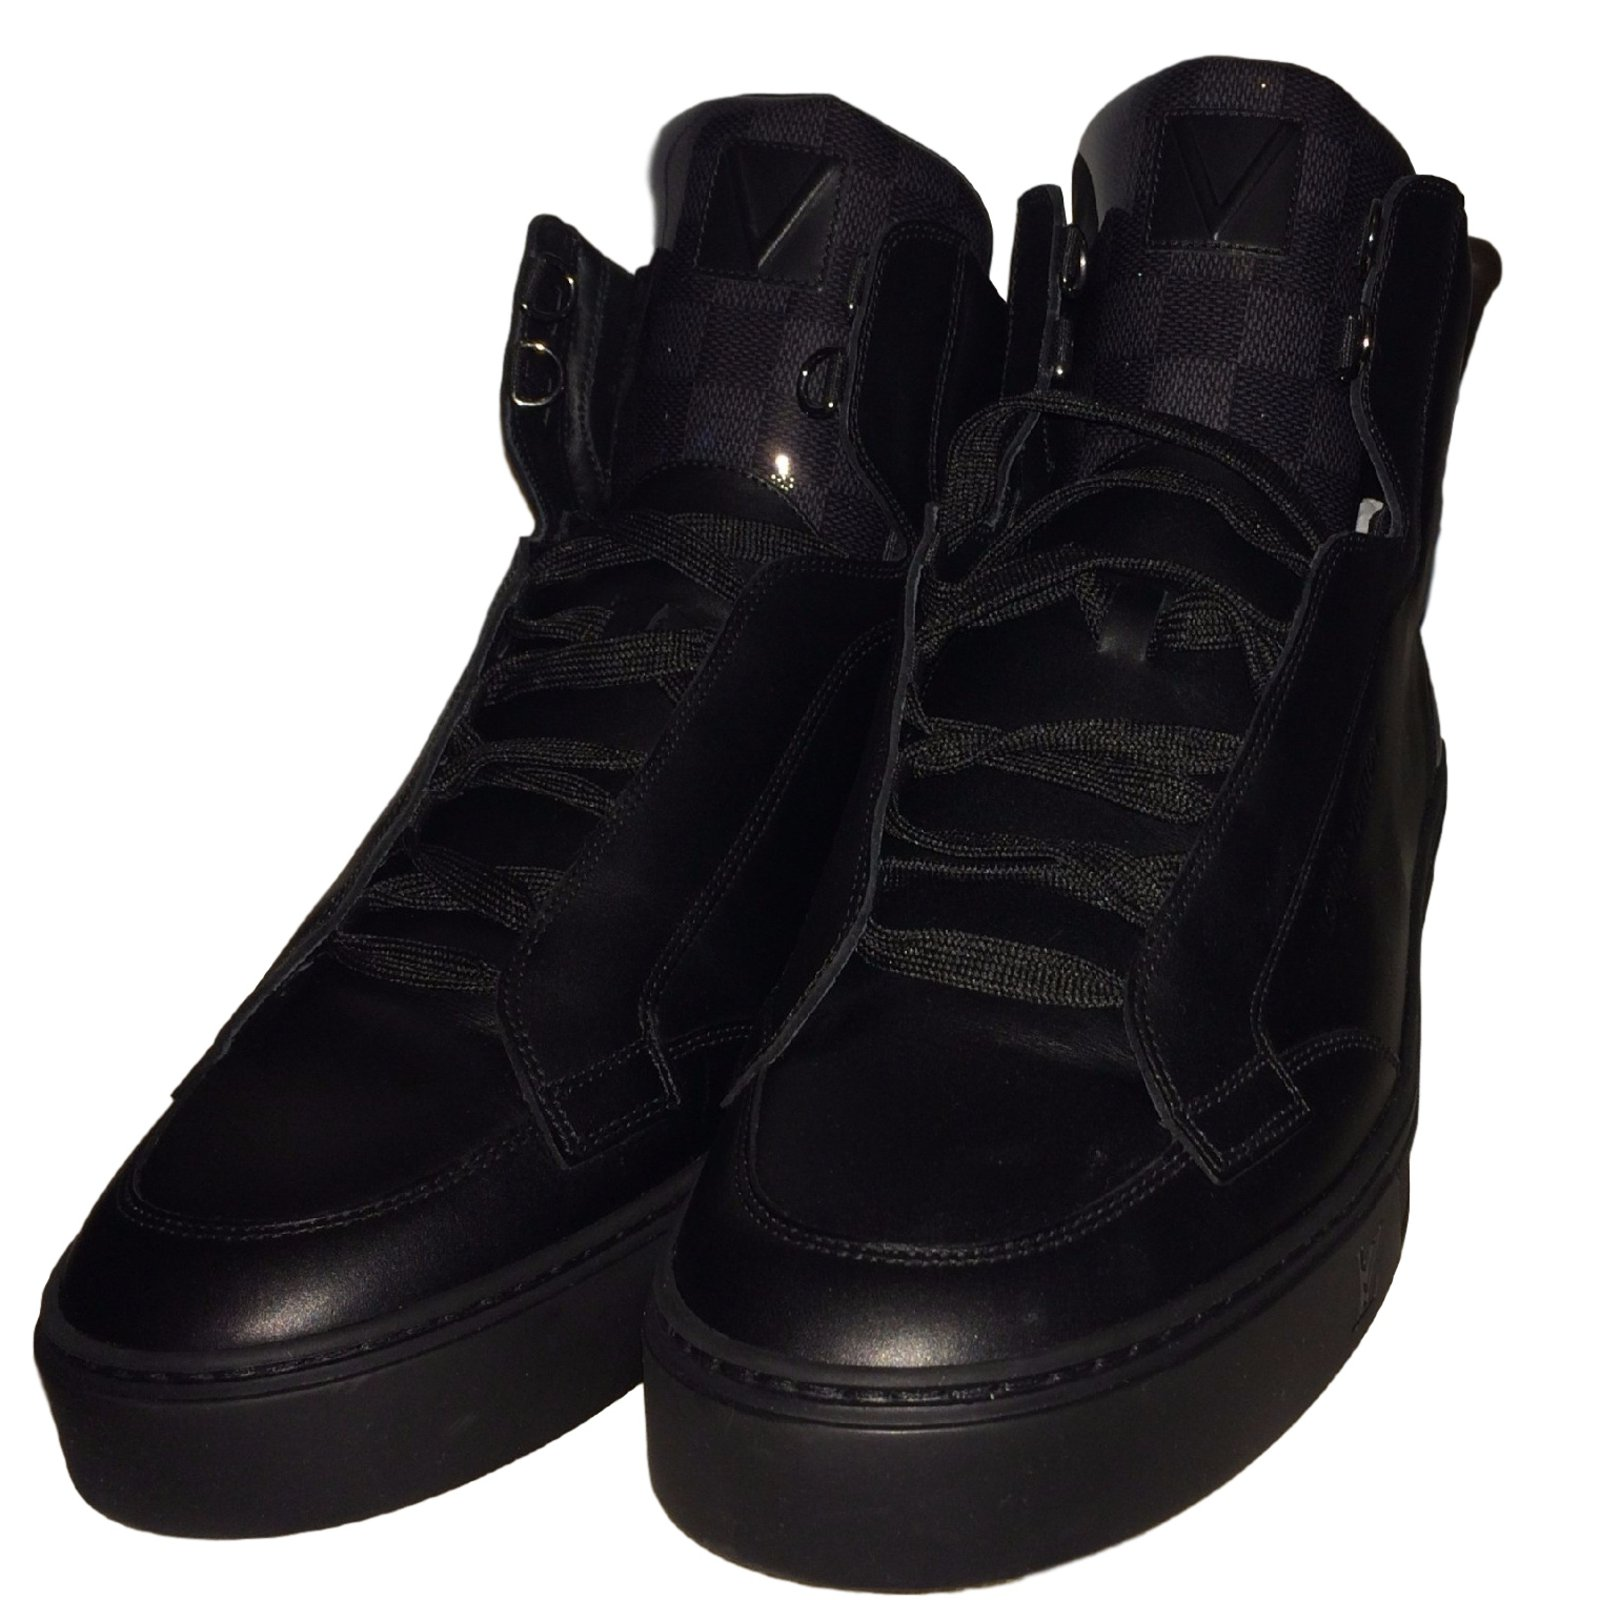 baskets homme louis vuitton speaker sneaker boot cuir noir. Black Bedroom Furniture Sets. Home Design Ideas